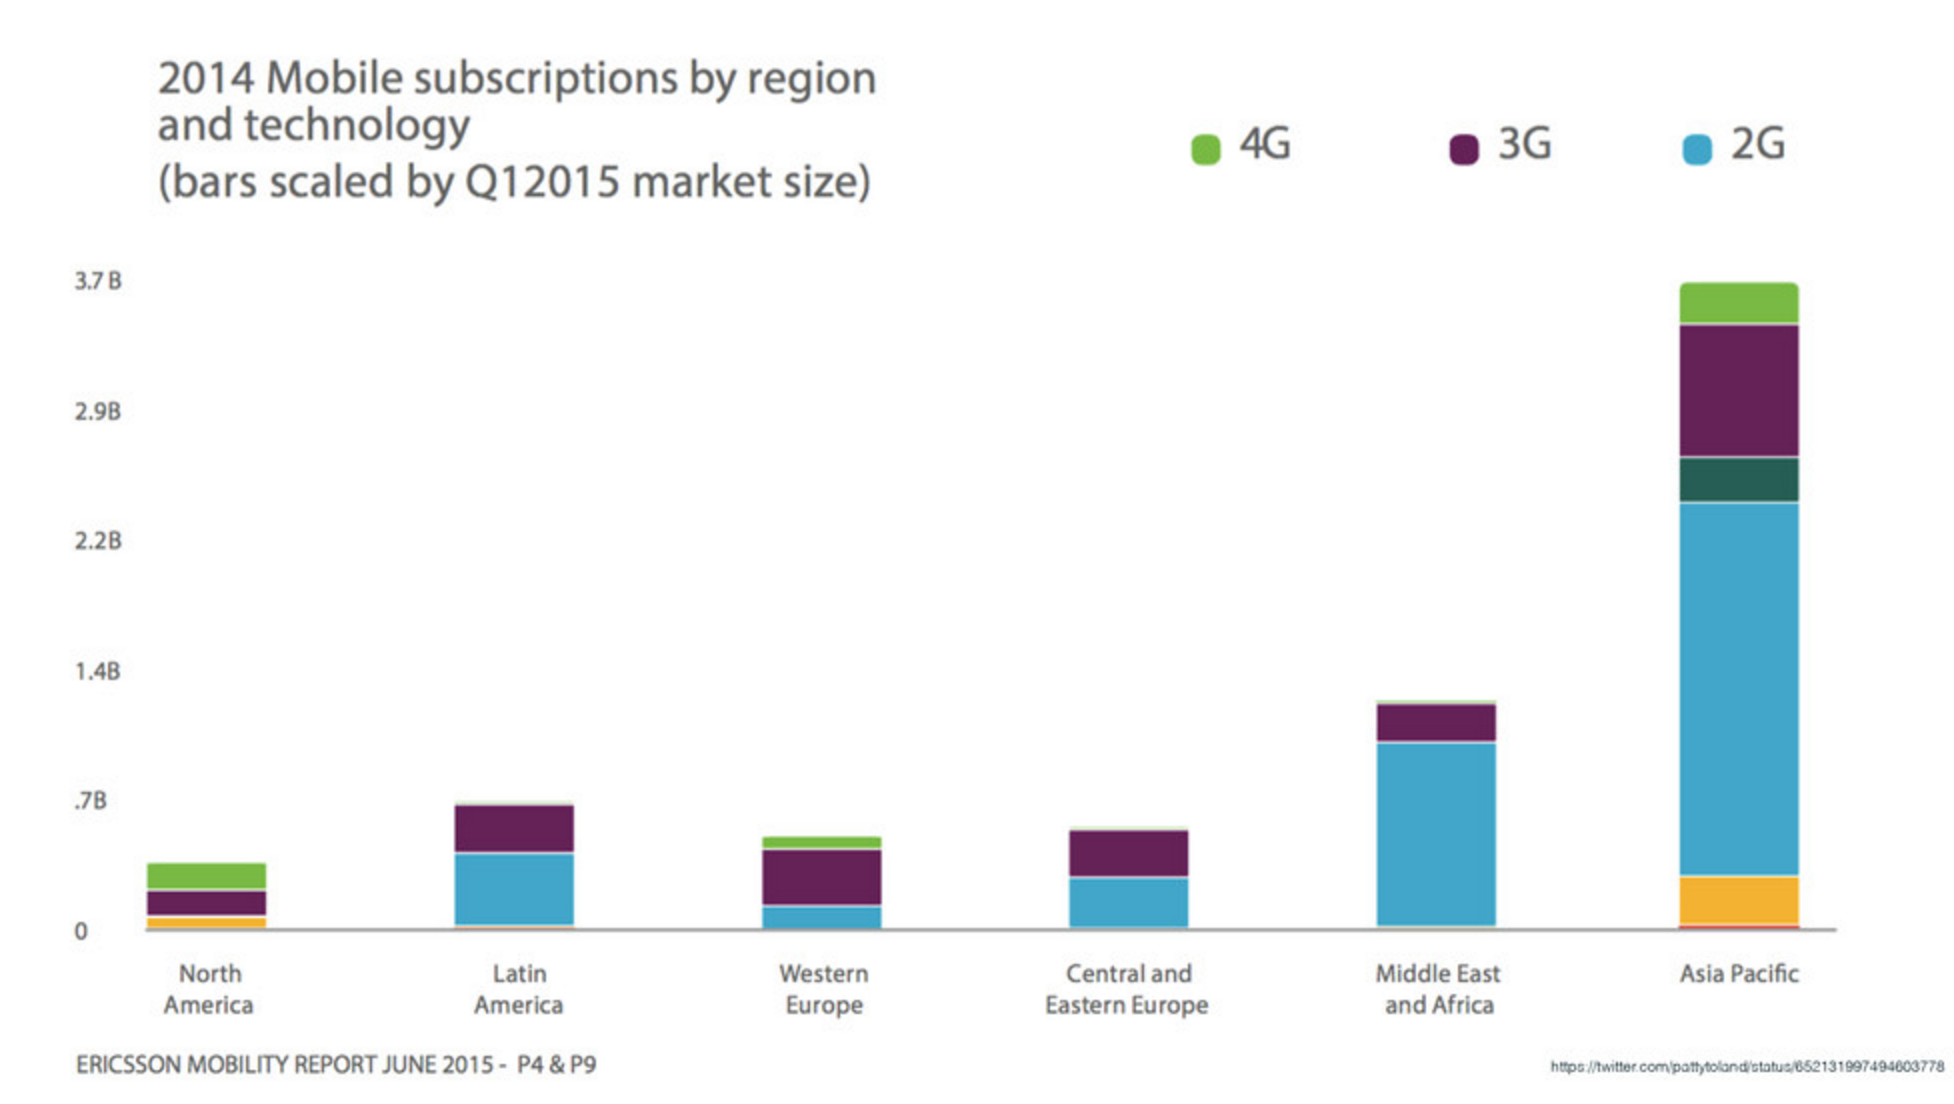 mobile-by-region-market-size.png (1×1 px, 541 KB)